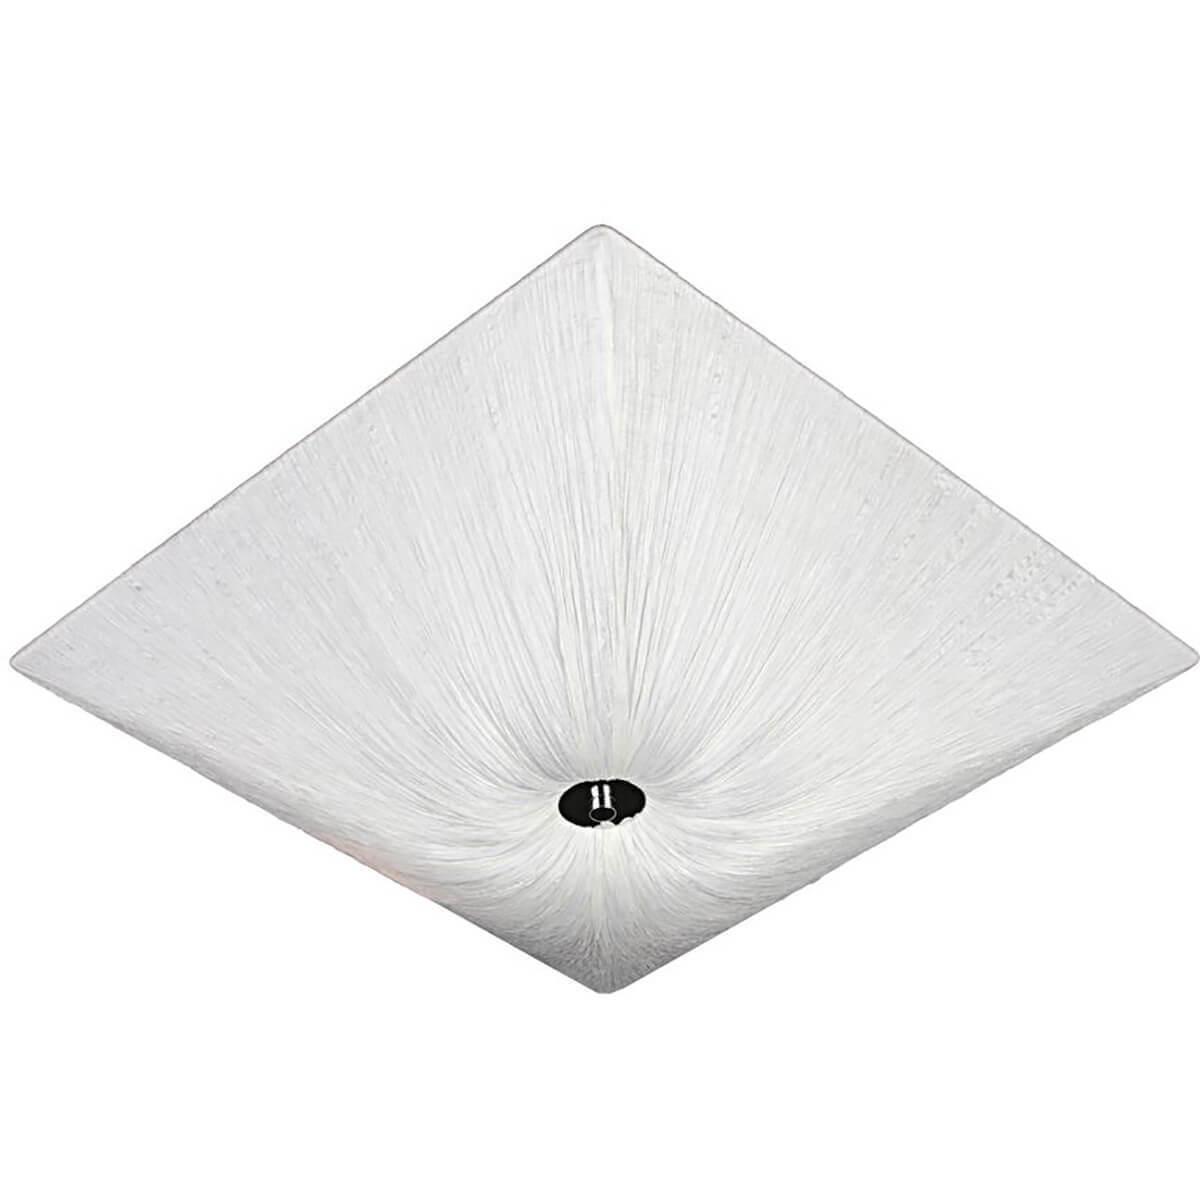 Накладной светильник Omnilux OML-42307-04, E27, 13 Вт